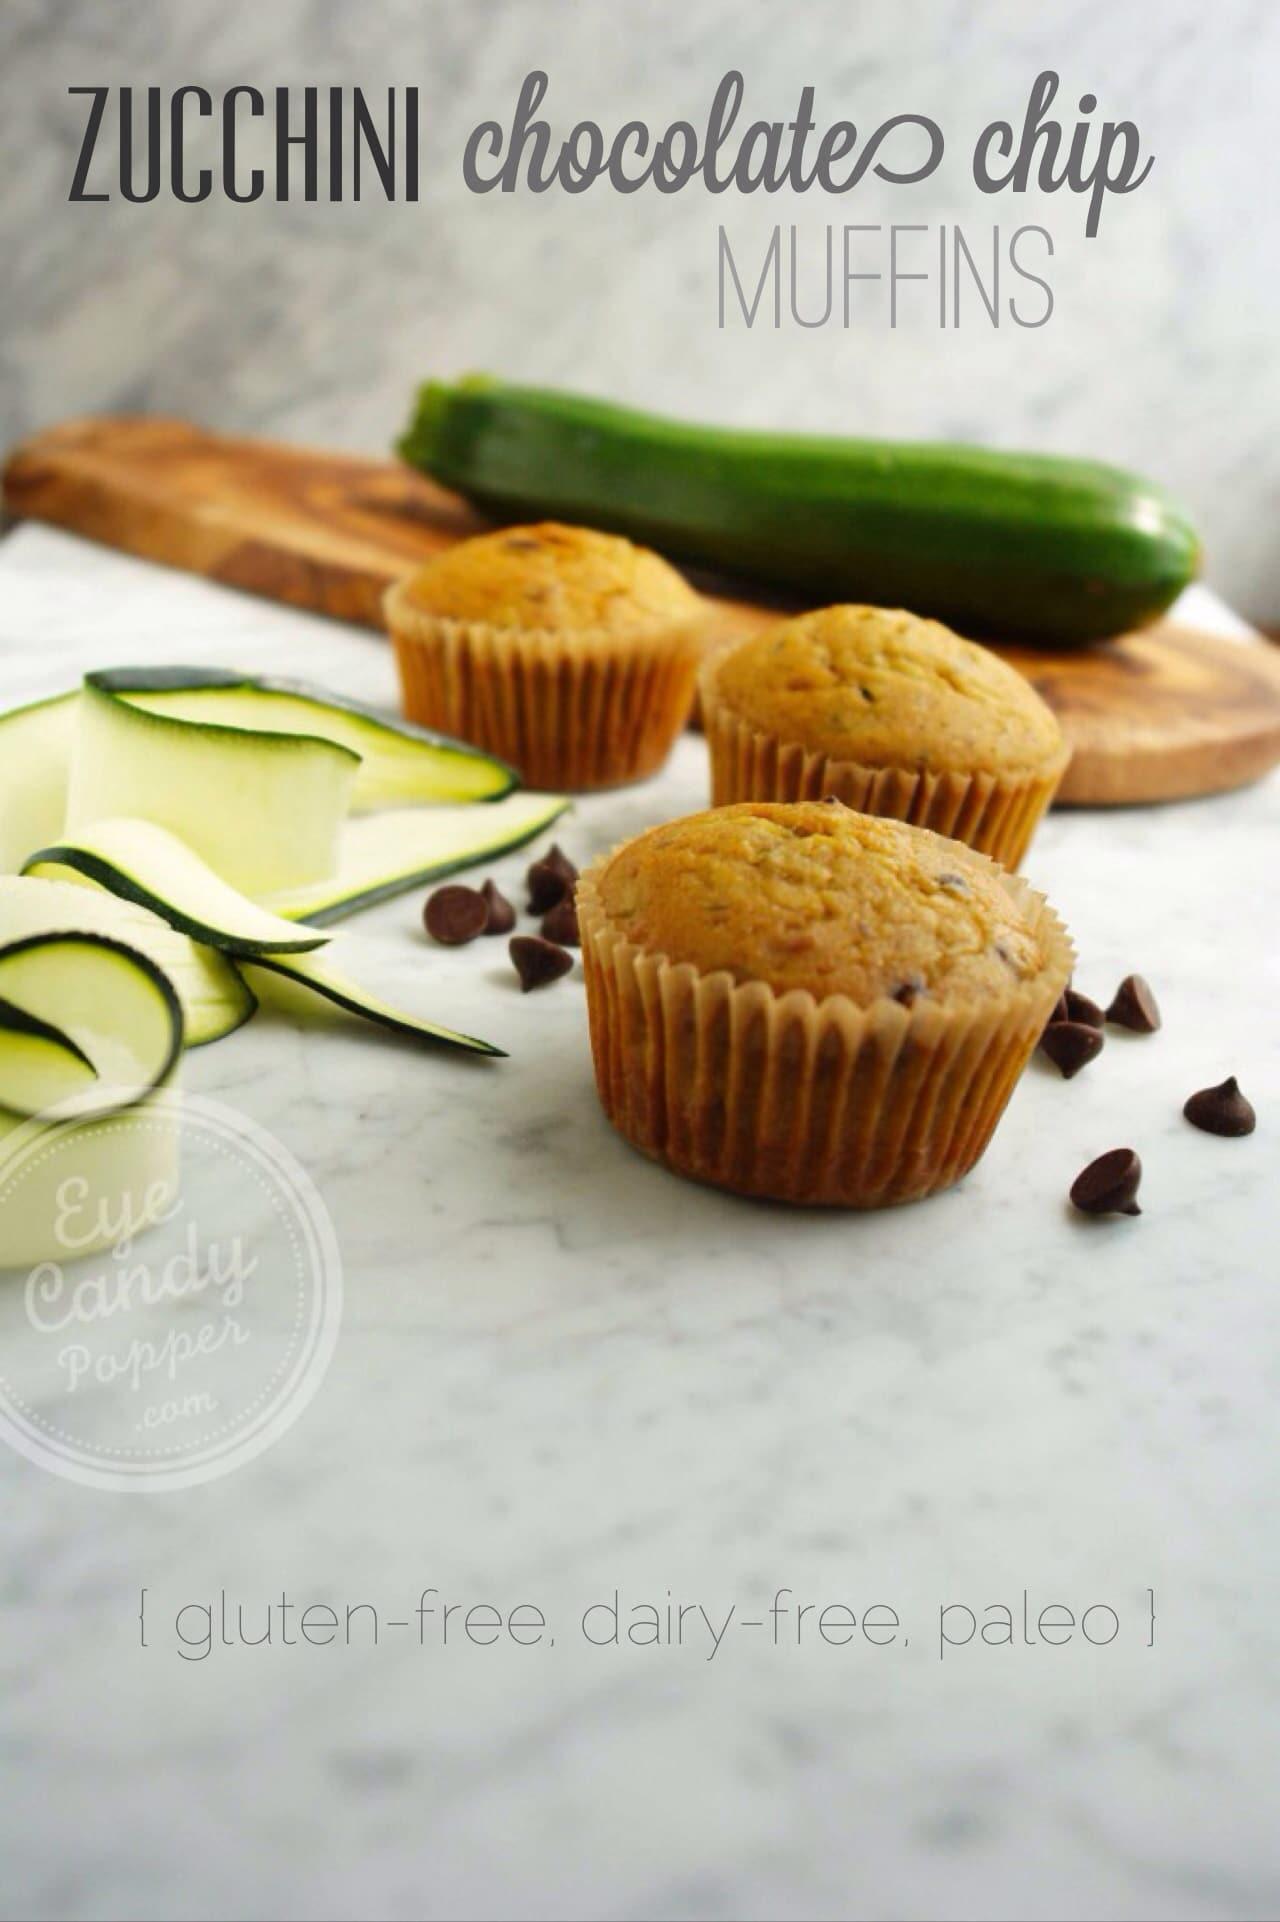 Wheatless Wednesday: Zucchini chocolate chip muffins (gluten-free, dairy-free, paleo-friendly)